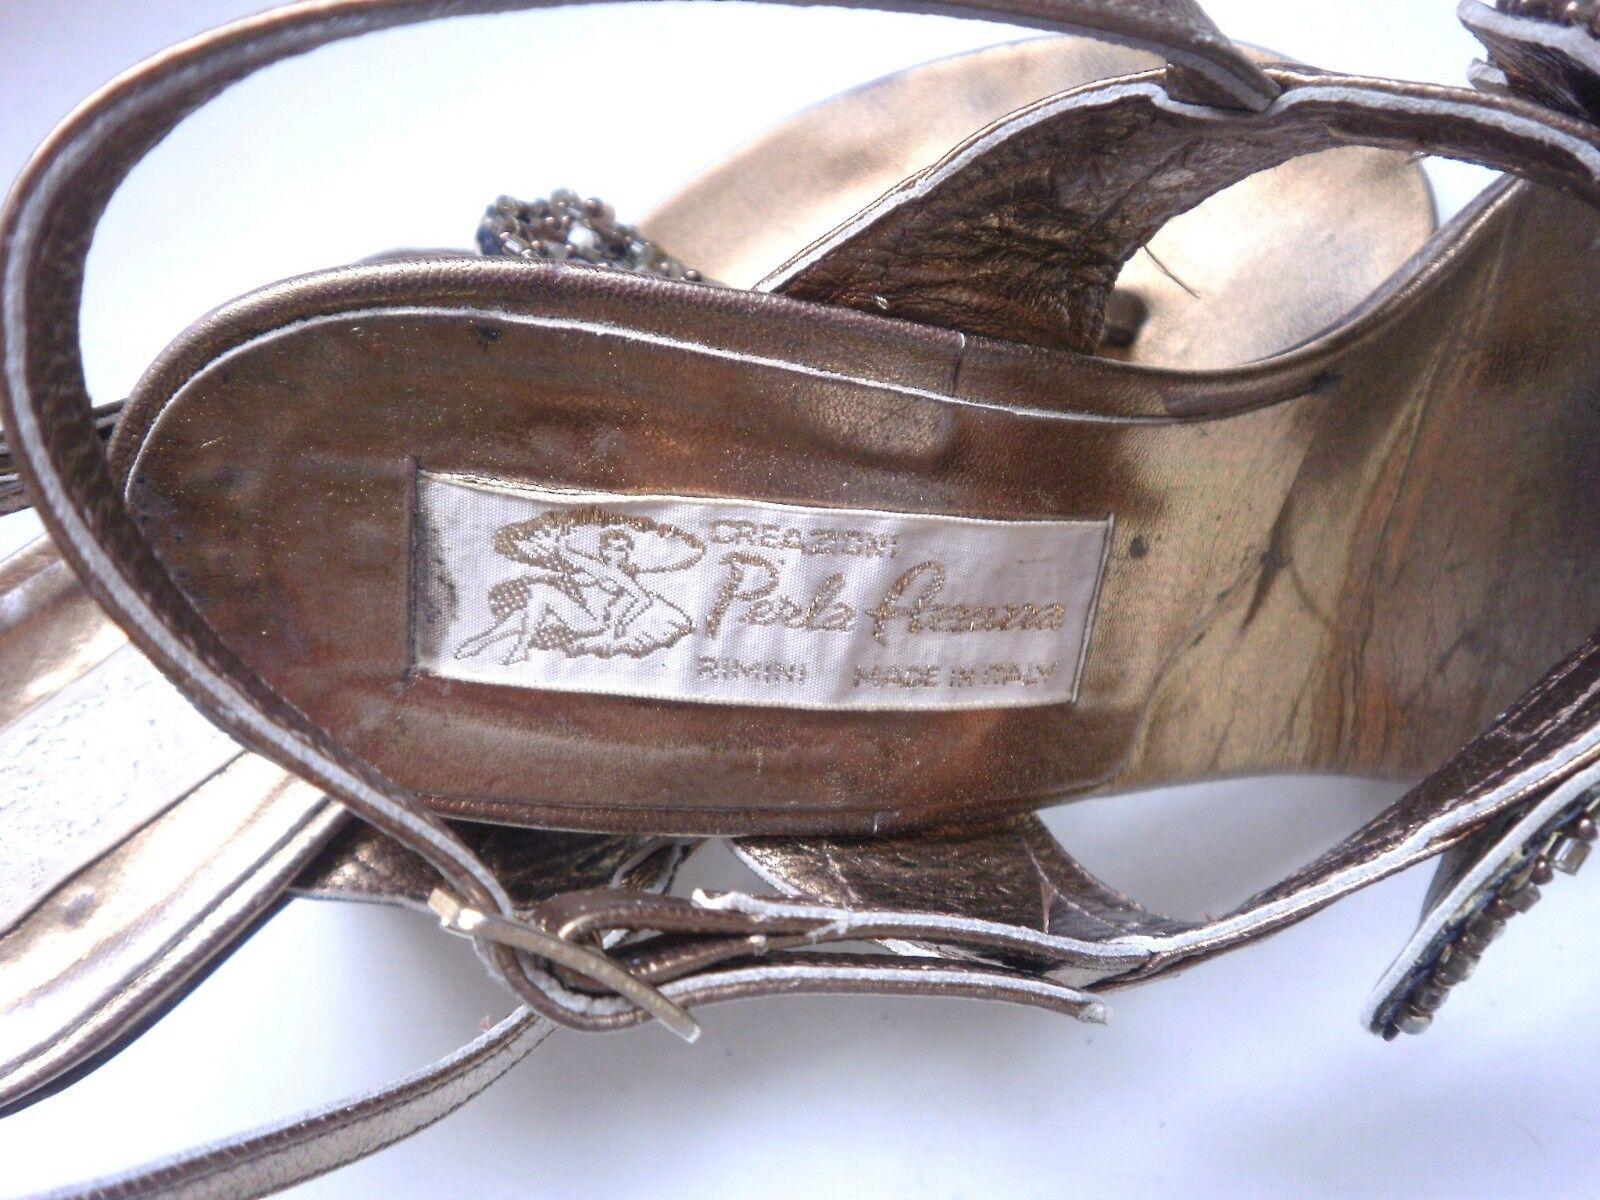 Perla fleurs Damen Sandaletten Pumps Rimini TRUE VINTBGE metalic gold Pailletten